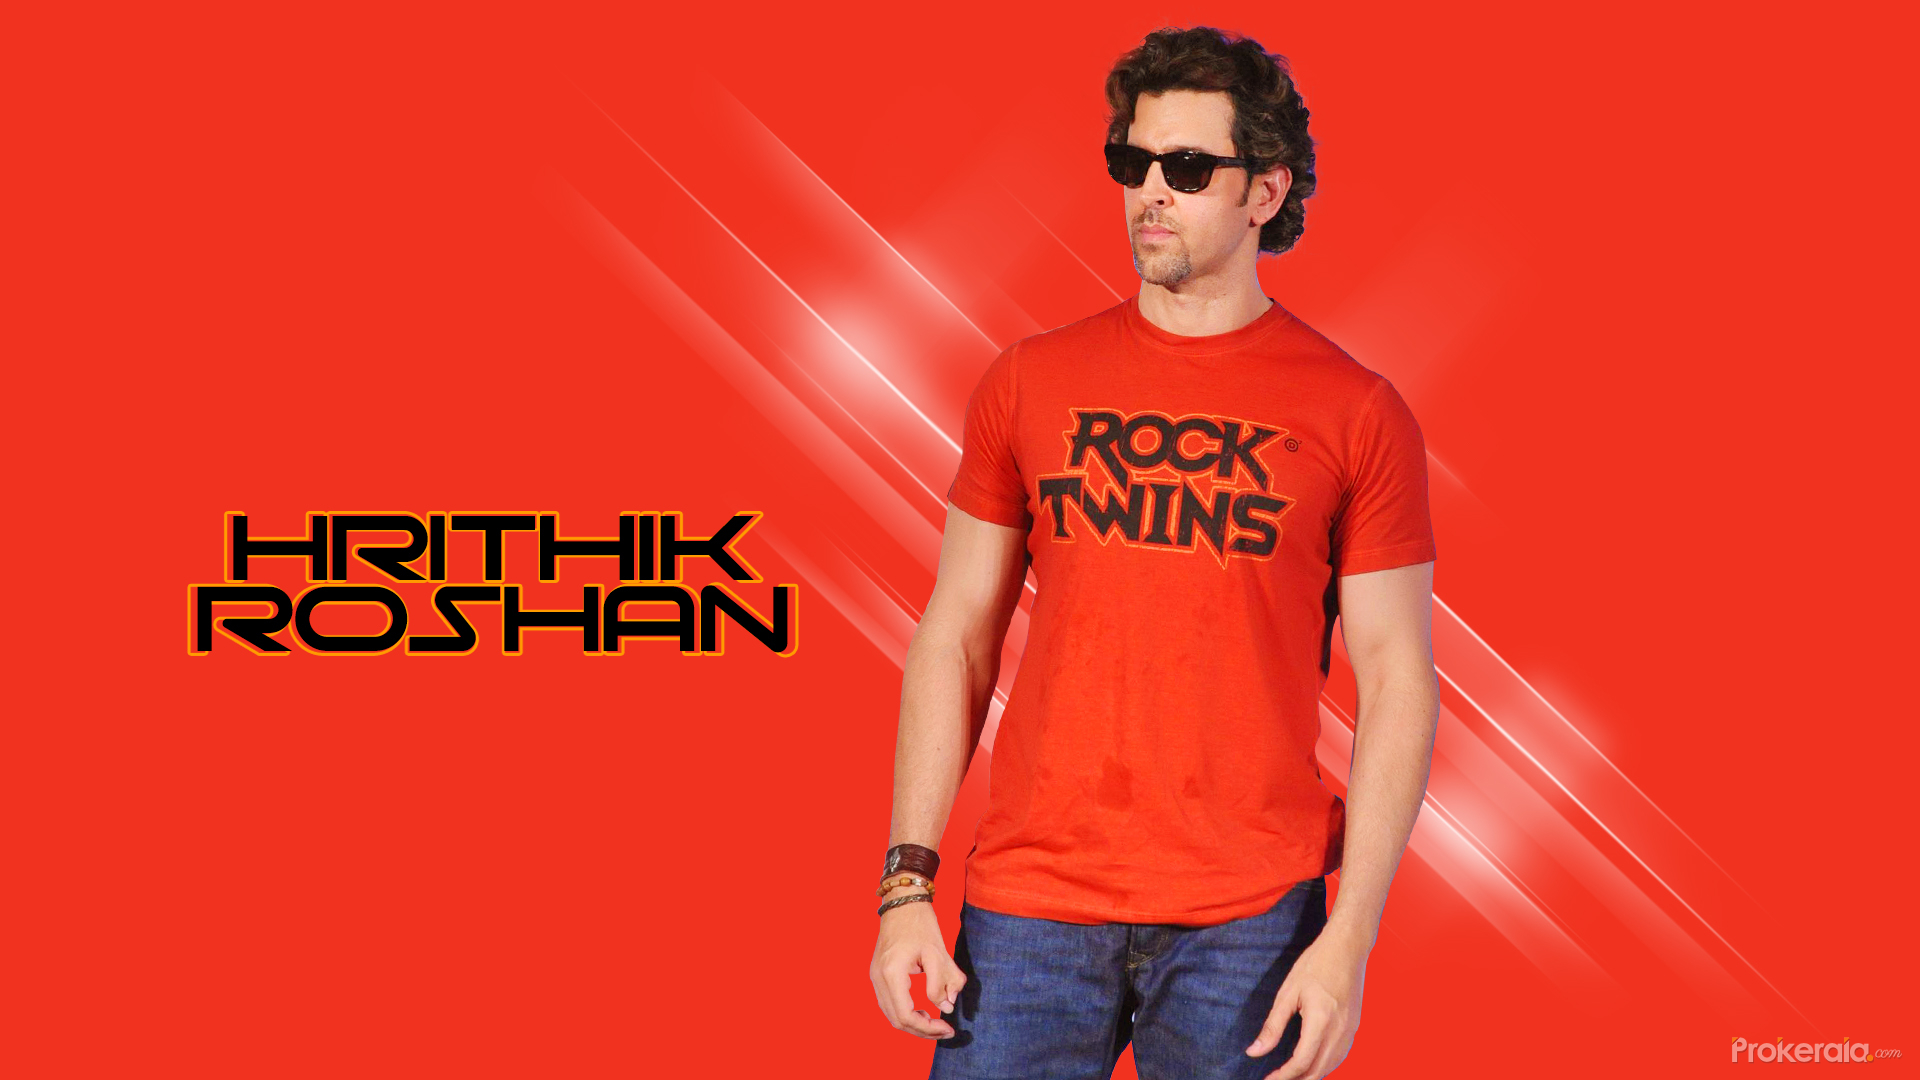 hrithik roshan new stylish wallpapers